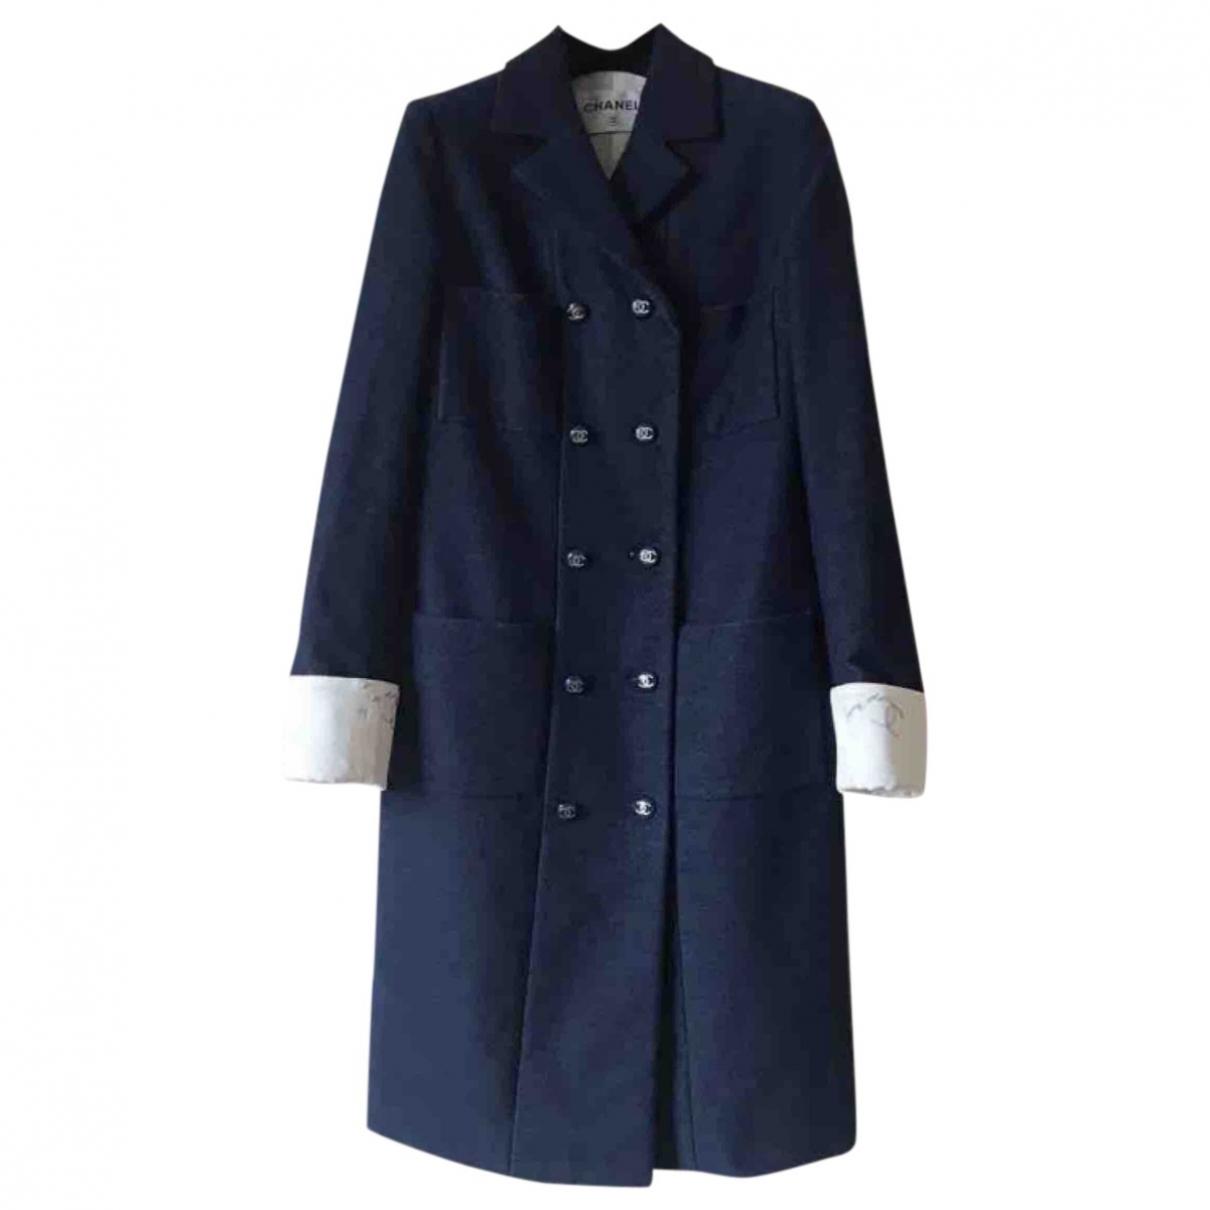 Chanel \N Navy Cotton coat for Women 34 FR